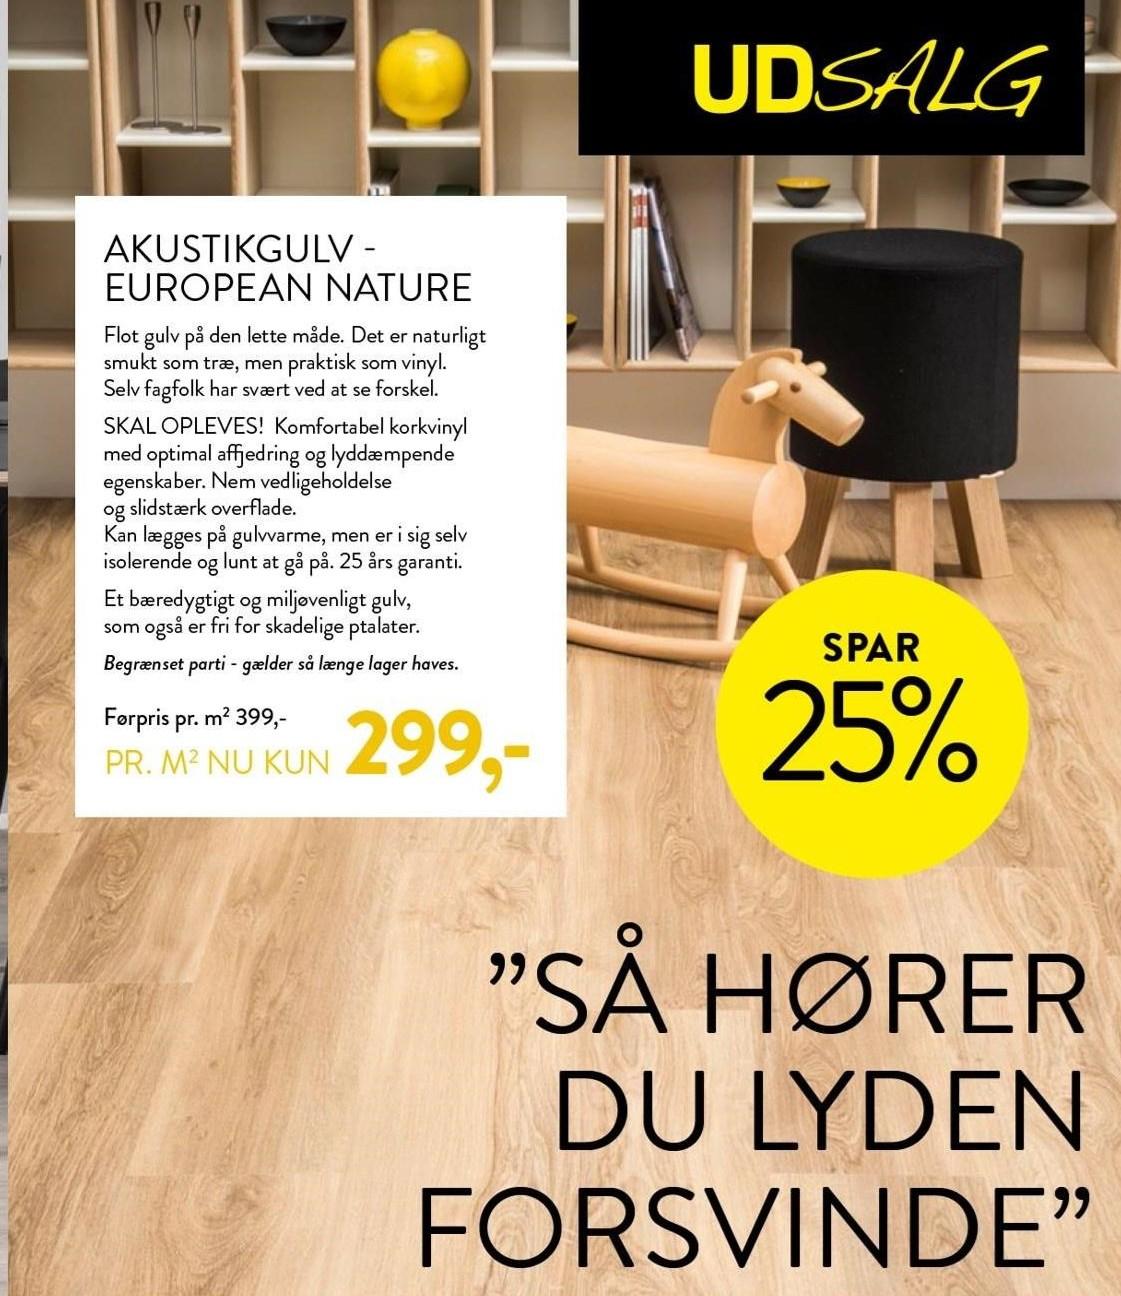 Akustikgulv - European nature